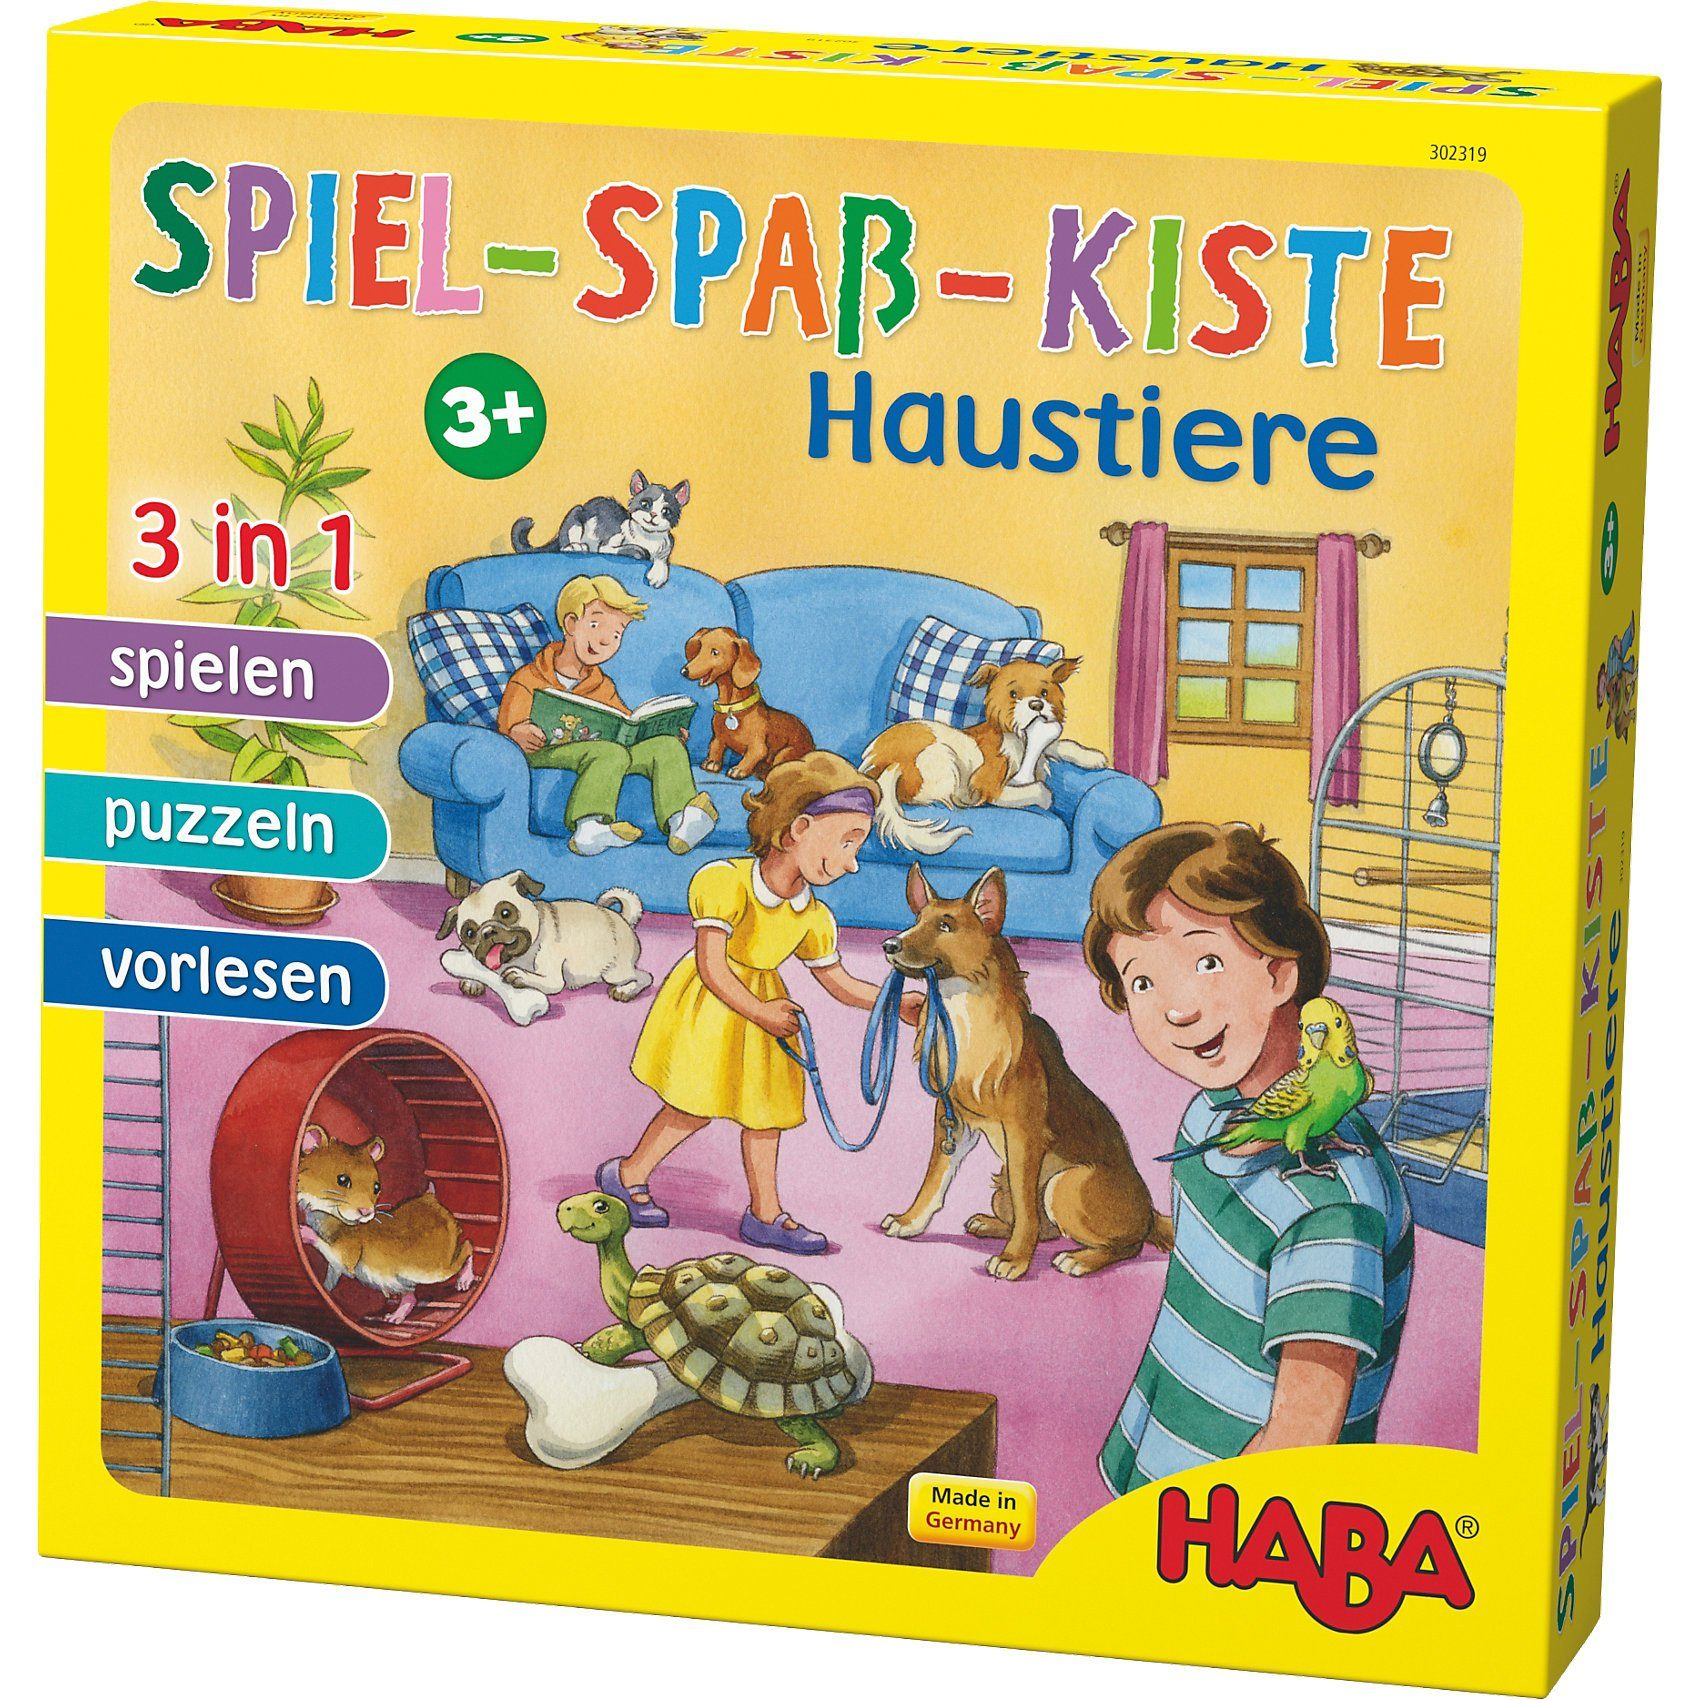 Haba Spiel-Spaß-Kiste Haustiere